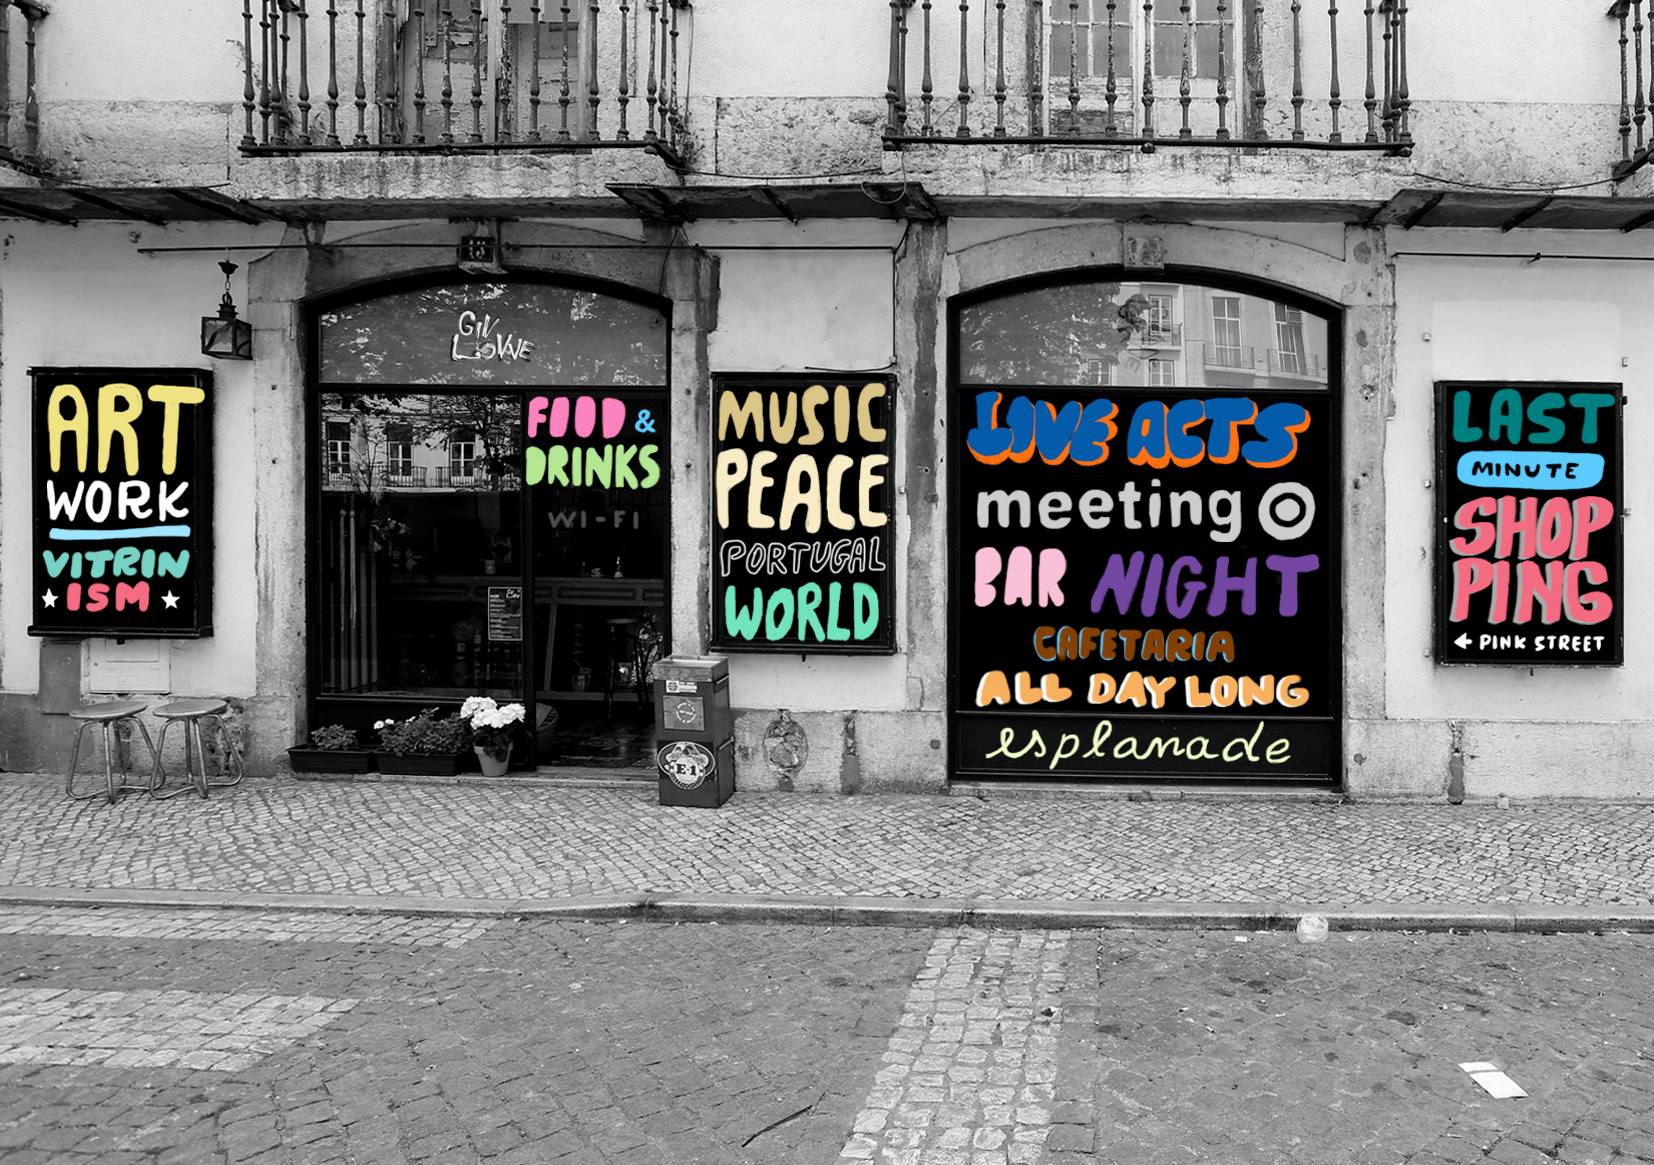 Giv Lowe - Lisbonne